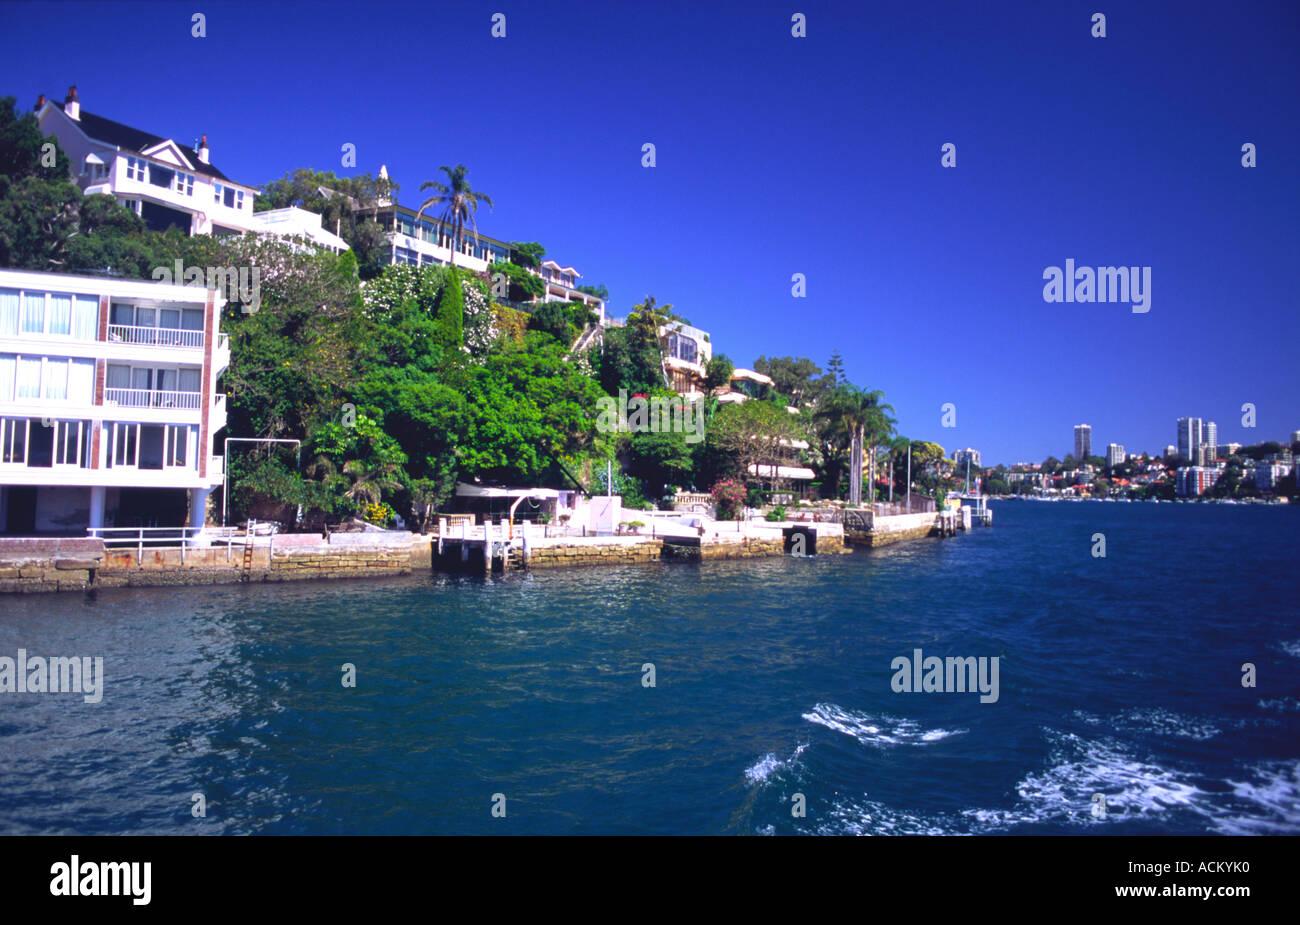 Sydney Harbour, New South Wales, Australia. Stock Photo